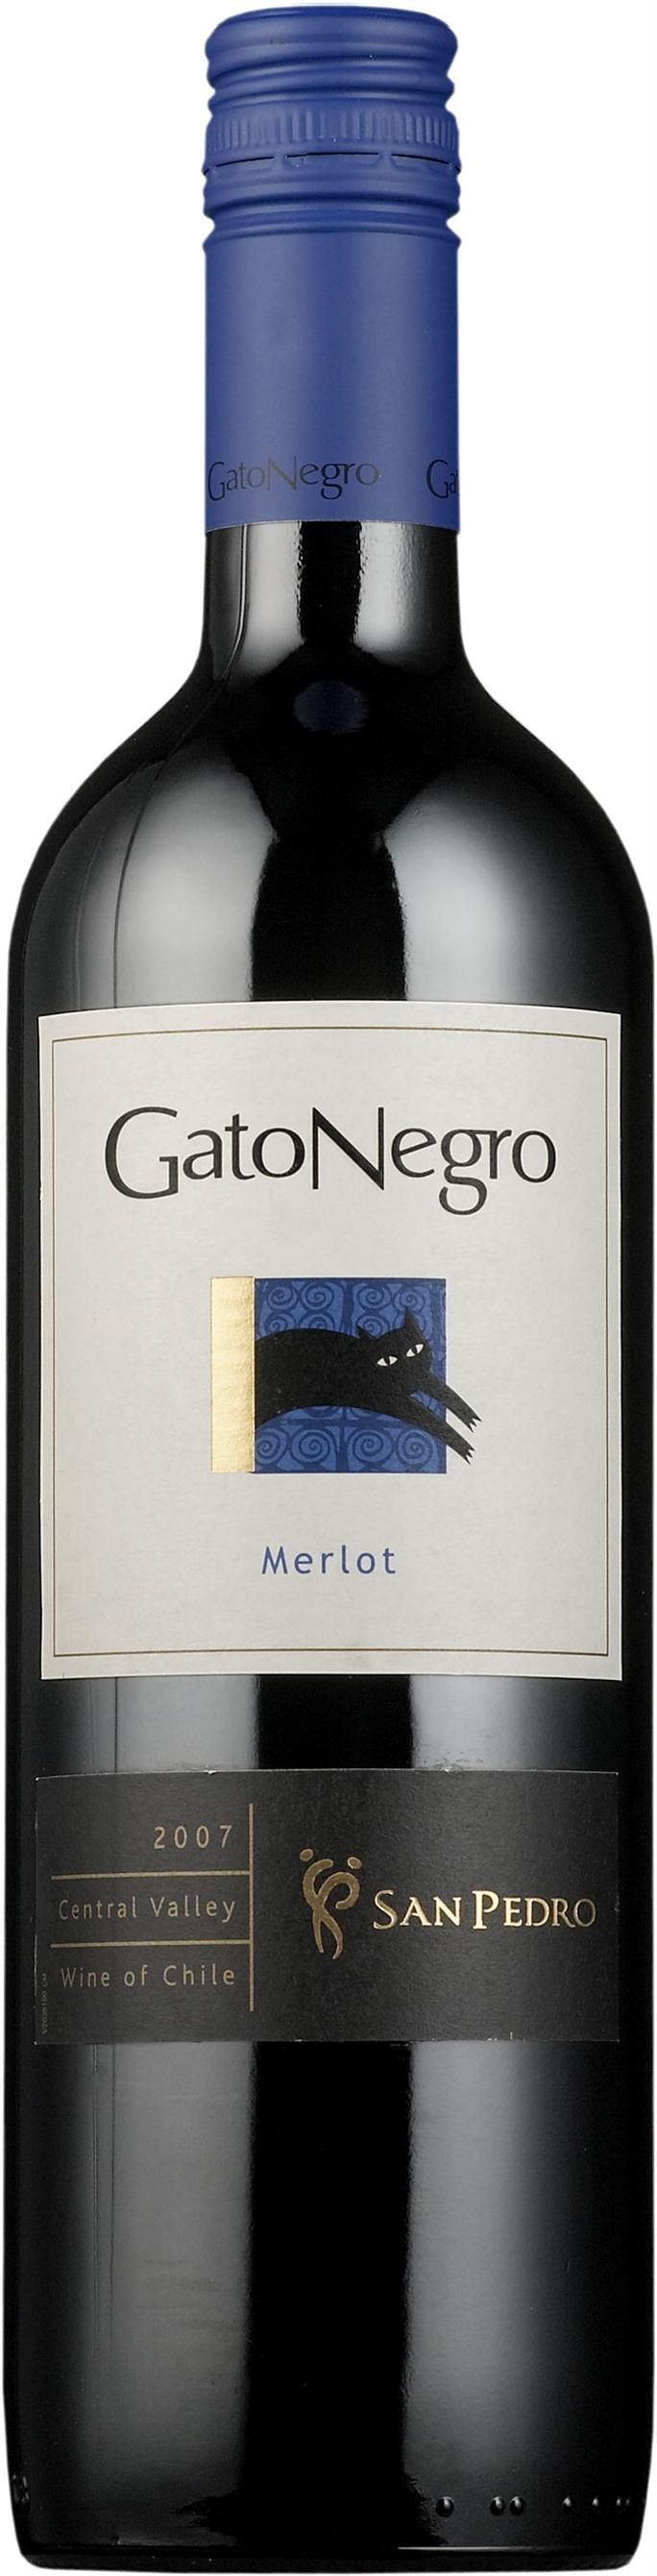 Gato Negro 2011 Merlot (Valle Central, Chile)